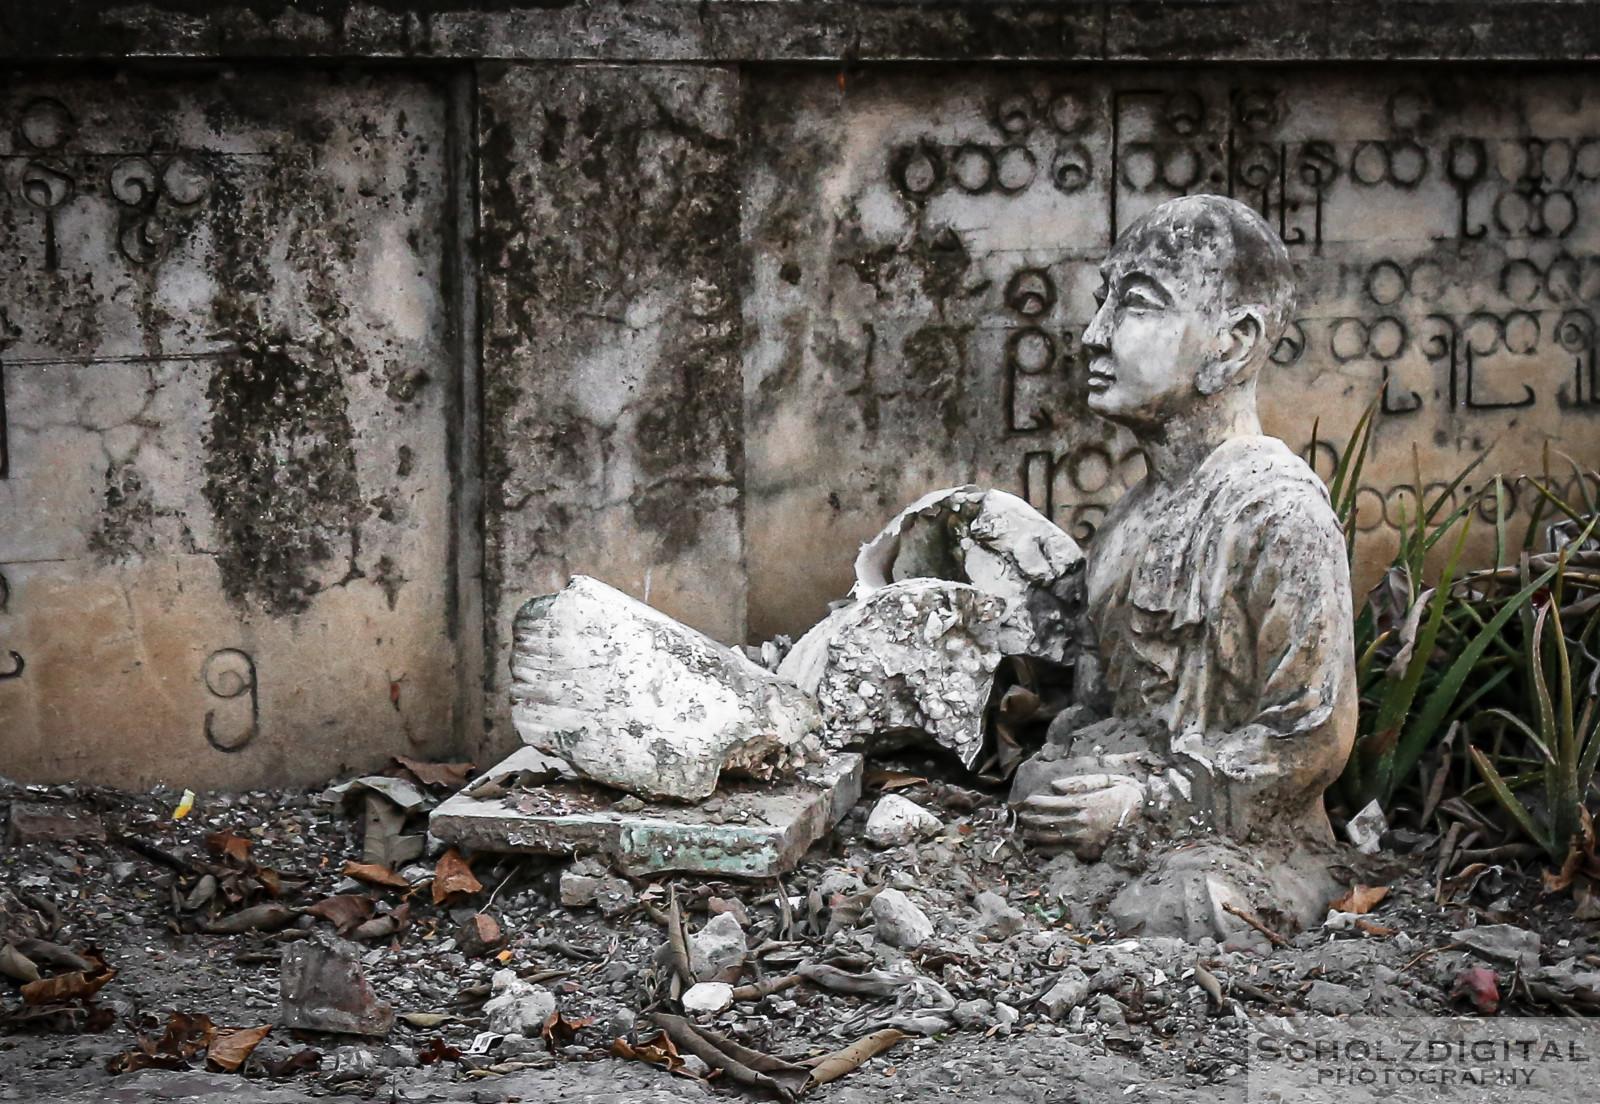 Birma, Buddha, Burma, Exploring, Figuren, Figurs, Handwerk, Mandalay, Marble, Marmor, Myanmar, Statuen, Steinmetz, Travelling, Reisebericht, Skulpturen, Abandoned, Monastery,Southeastasia, Streetphotography, travel, Travelling, travelphotography, Wanderlust